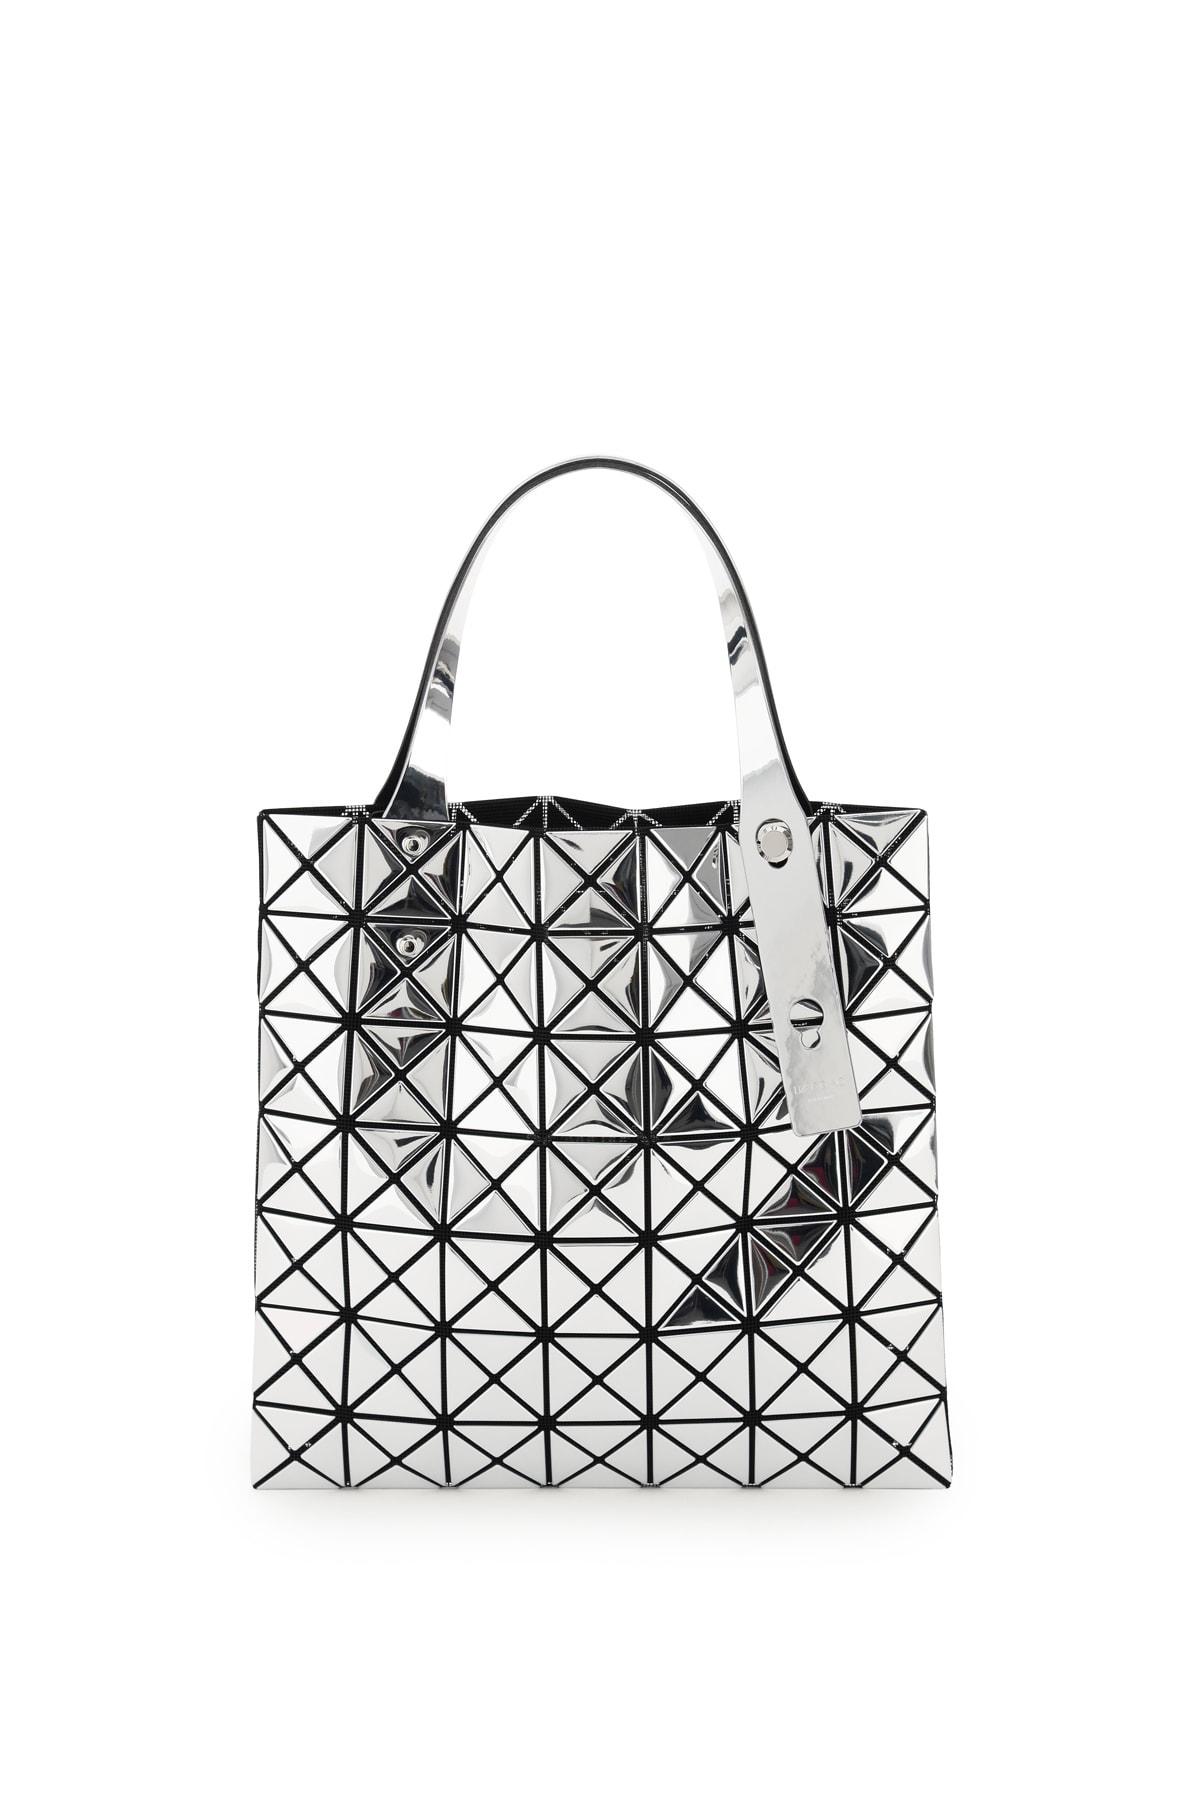 Bao Bao Issey Miyake Small Platinum Shopper